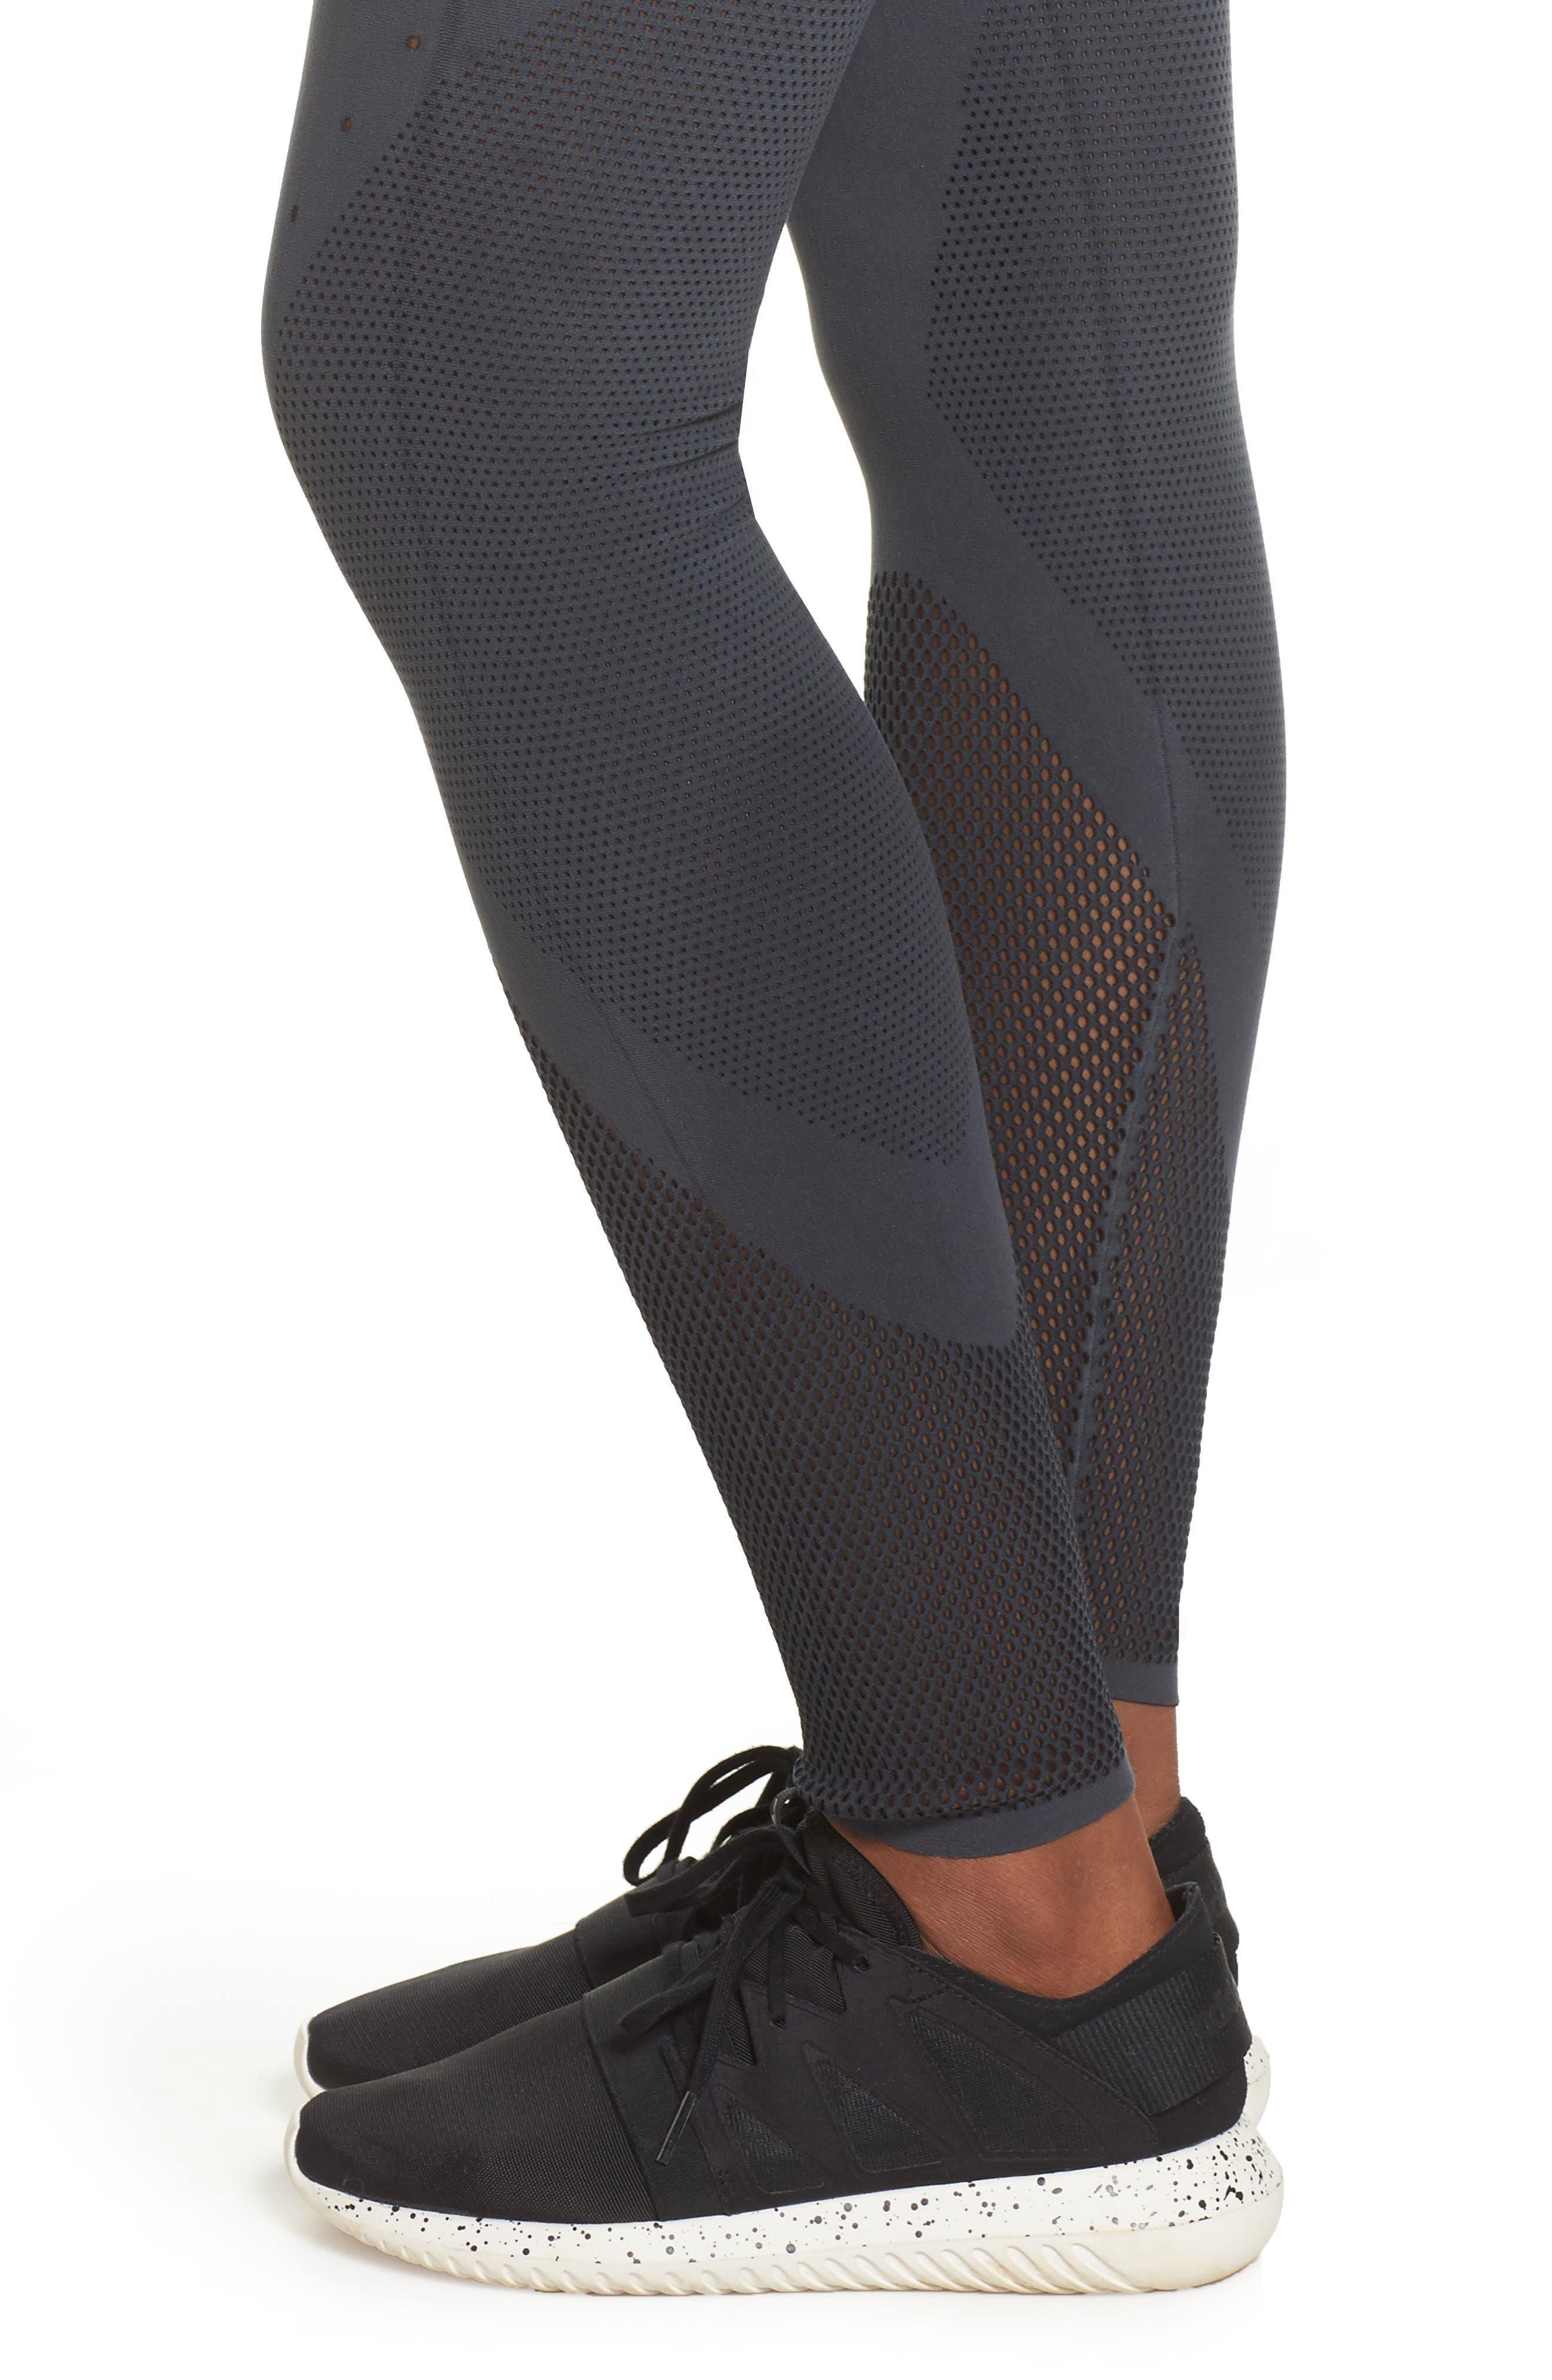 Warp Climacool<sup>®</sup> Knit Tights,                             Alternate thumbnail 4, color,                             Carbon/ Black